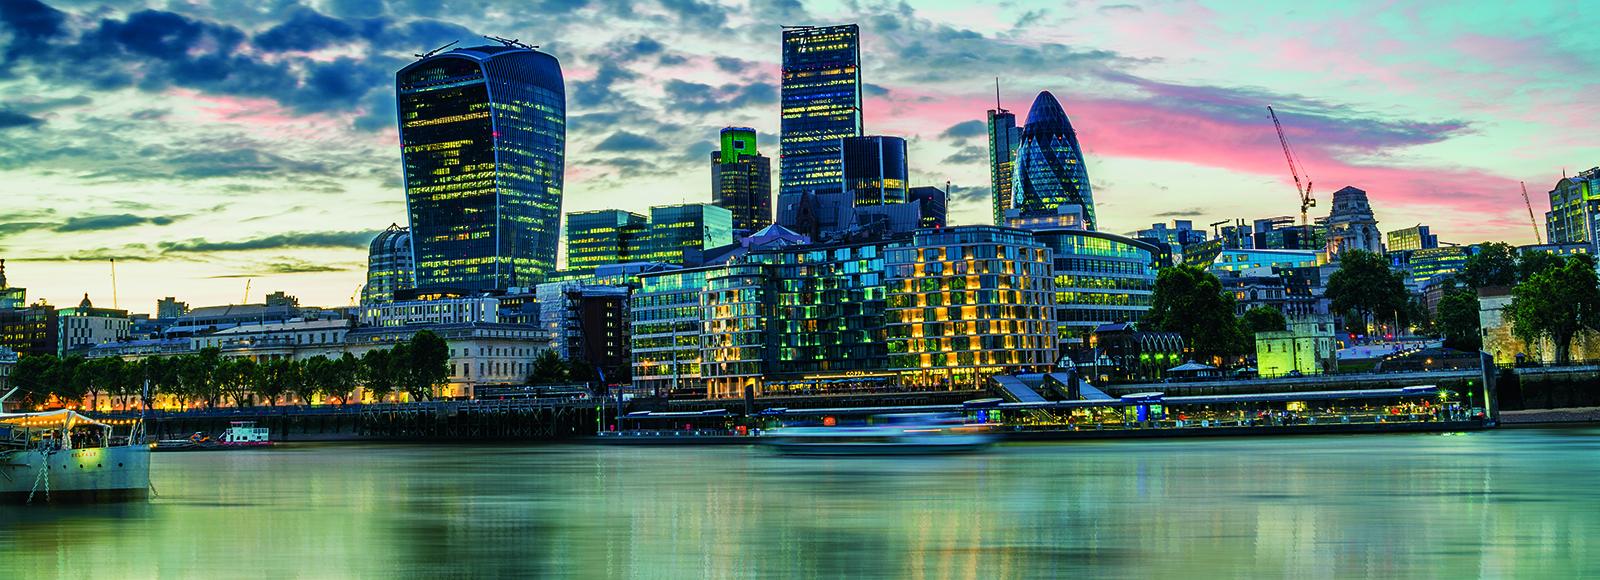 Image of london skyline